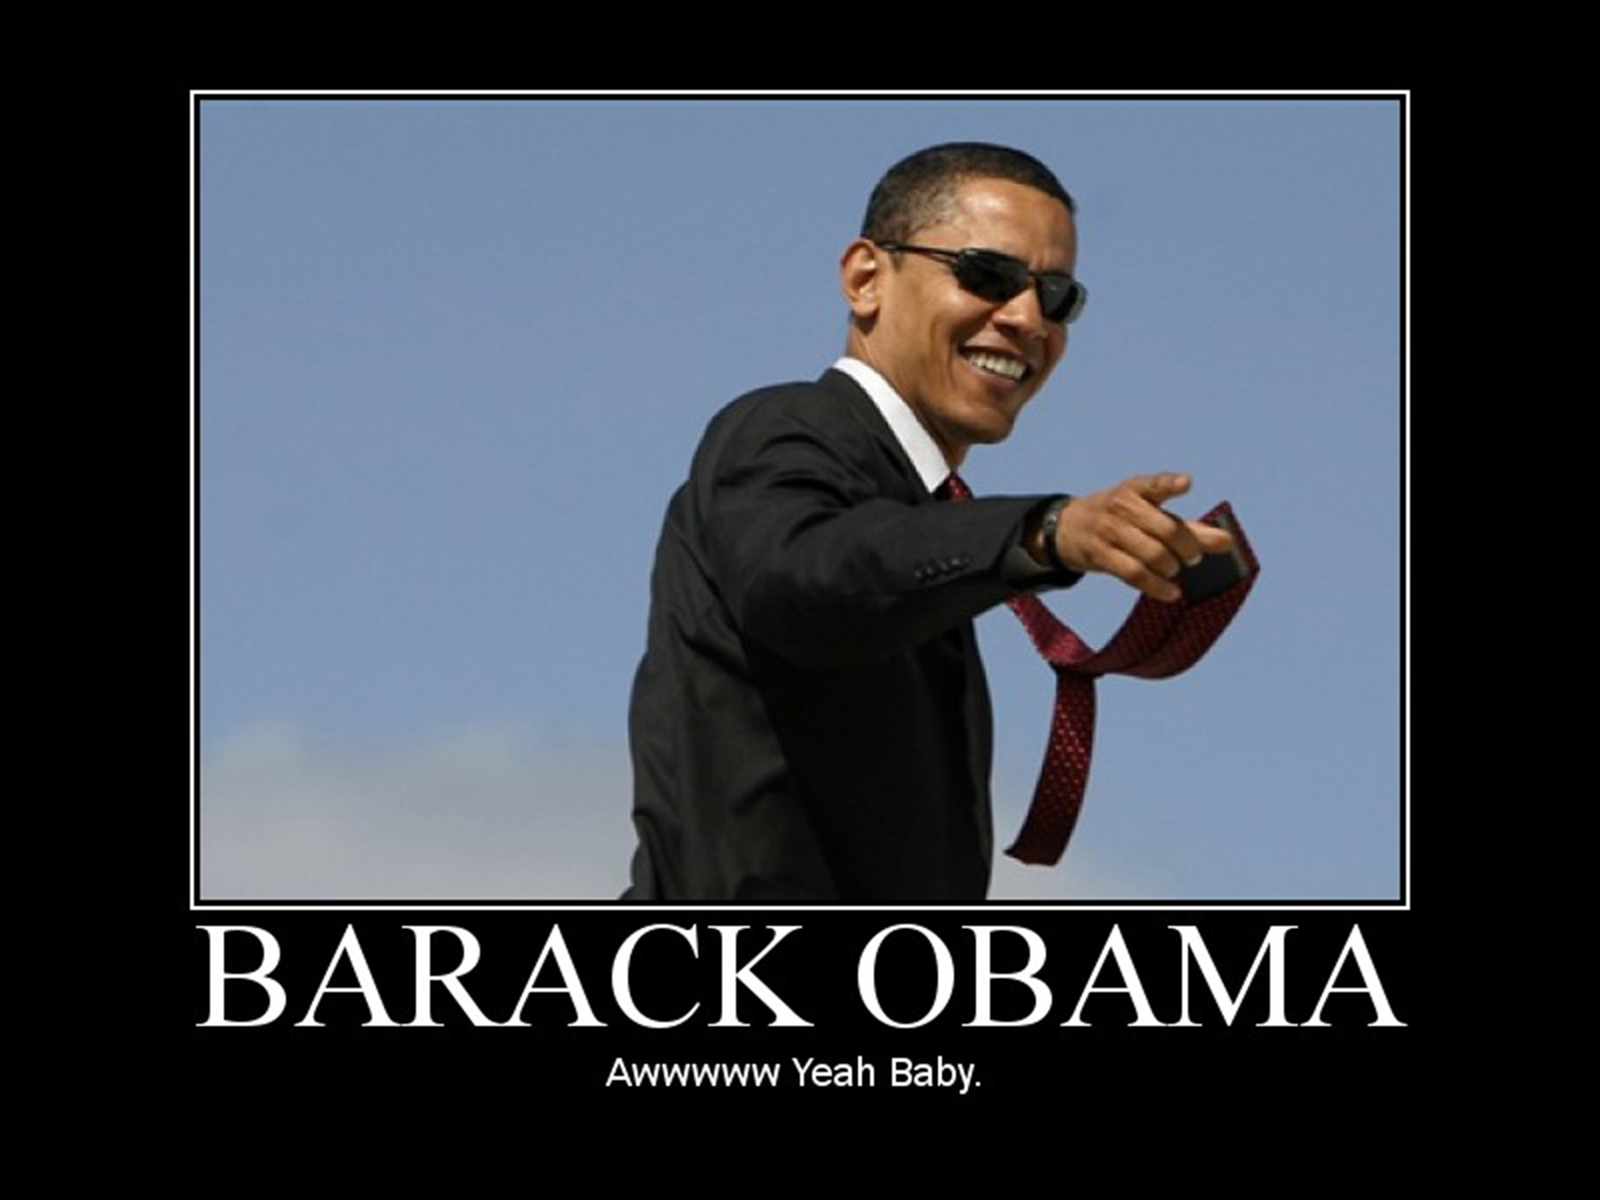 Barack Obama Image Full HD Wallpaper 3429 Wallpaper computer best 1600x1200